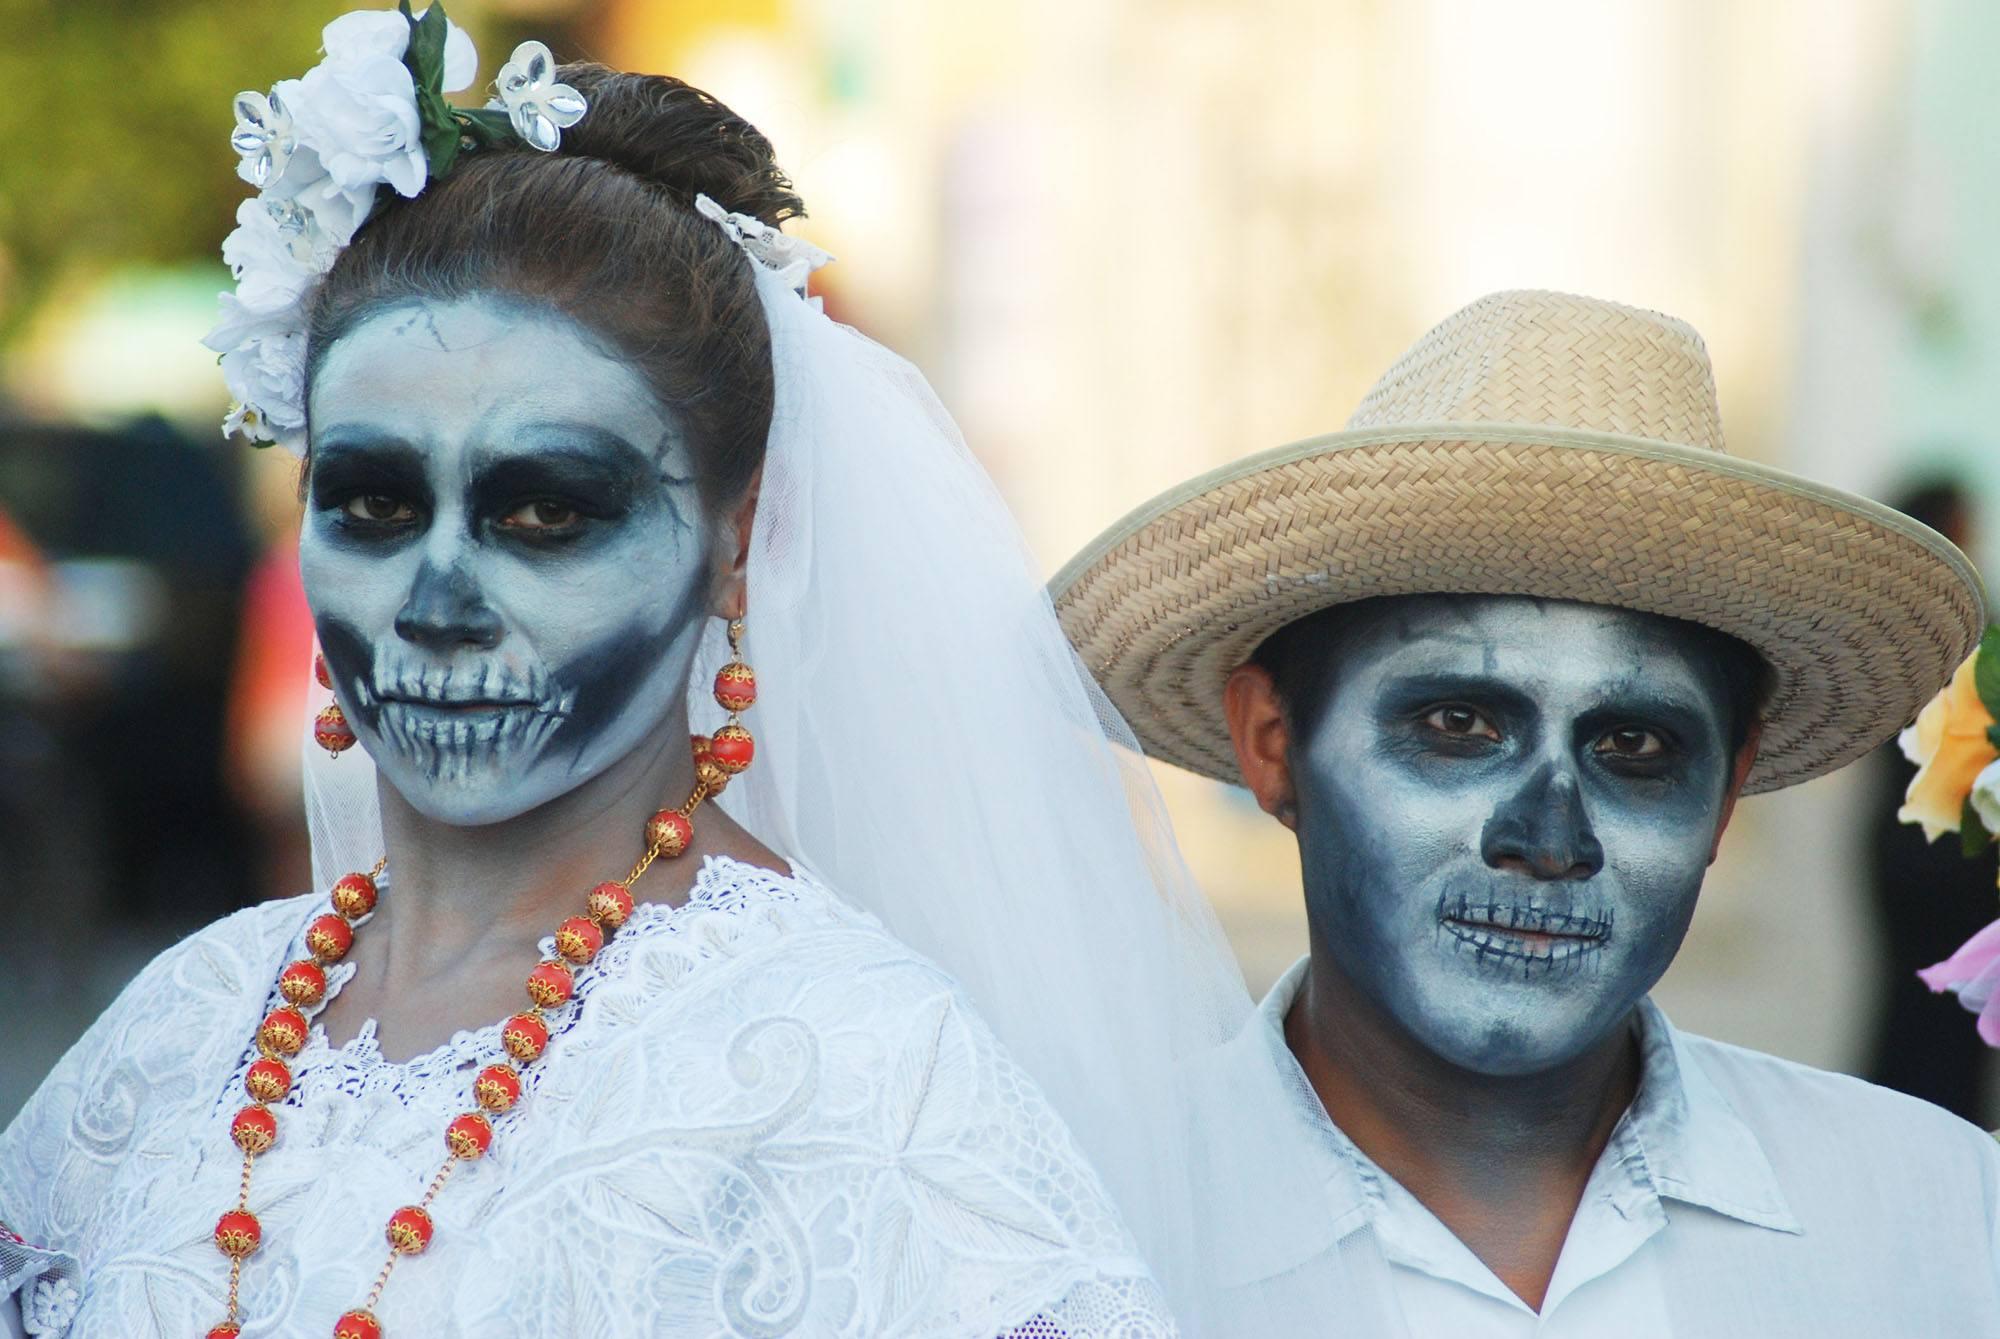 Catrina and Catrine face makeup (Mexico Tourism Board)